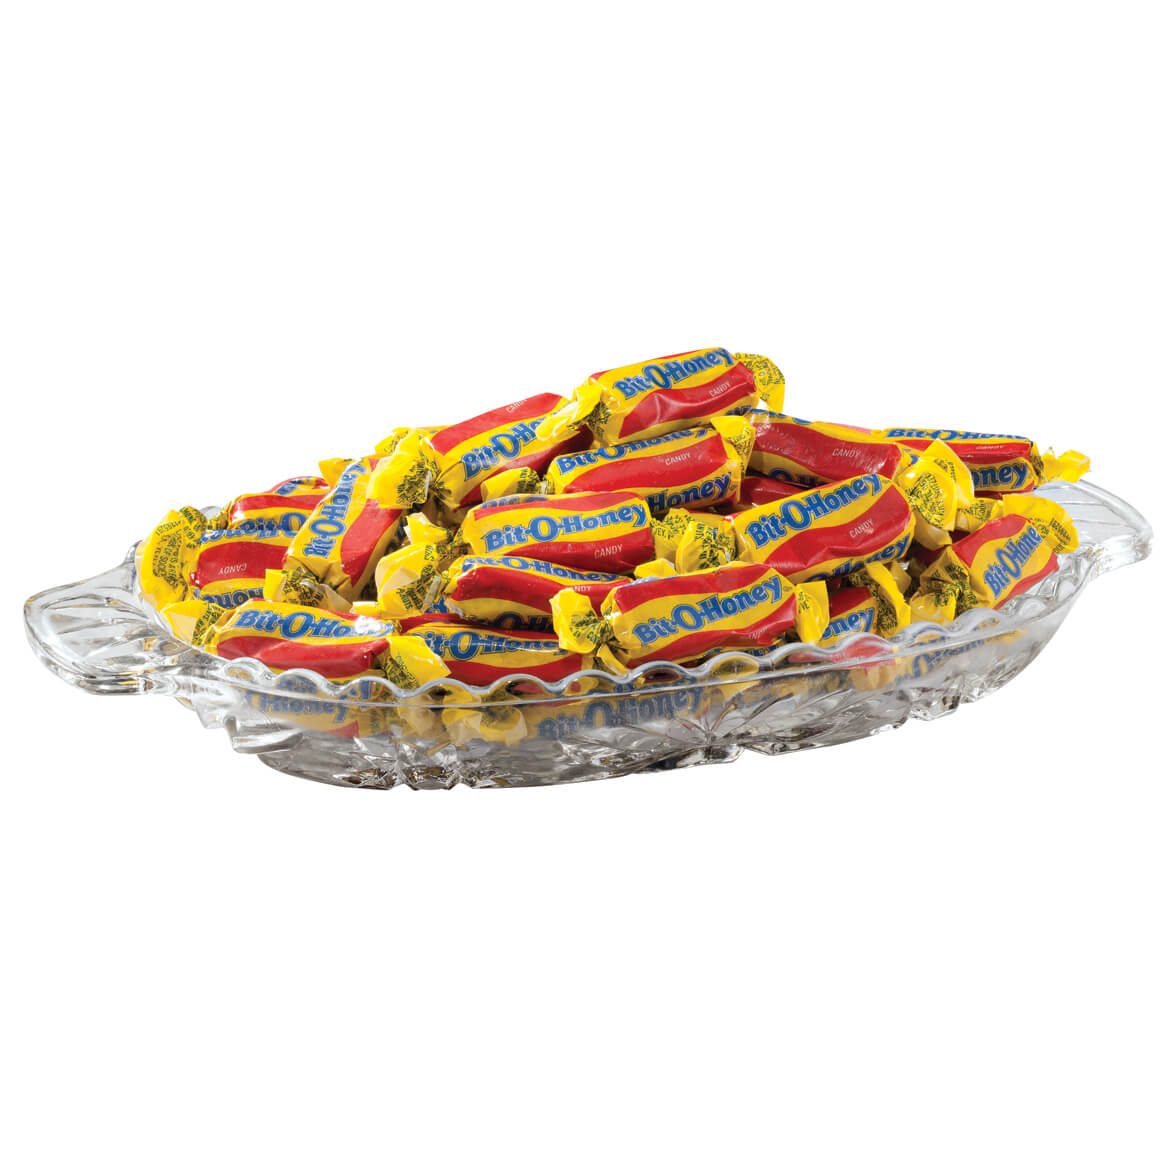 Bit-O-Honey Candy - 9.5 oz.-331832